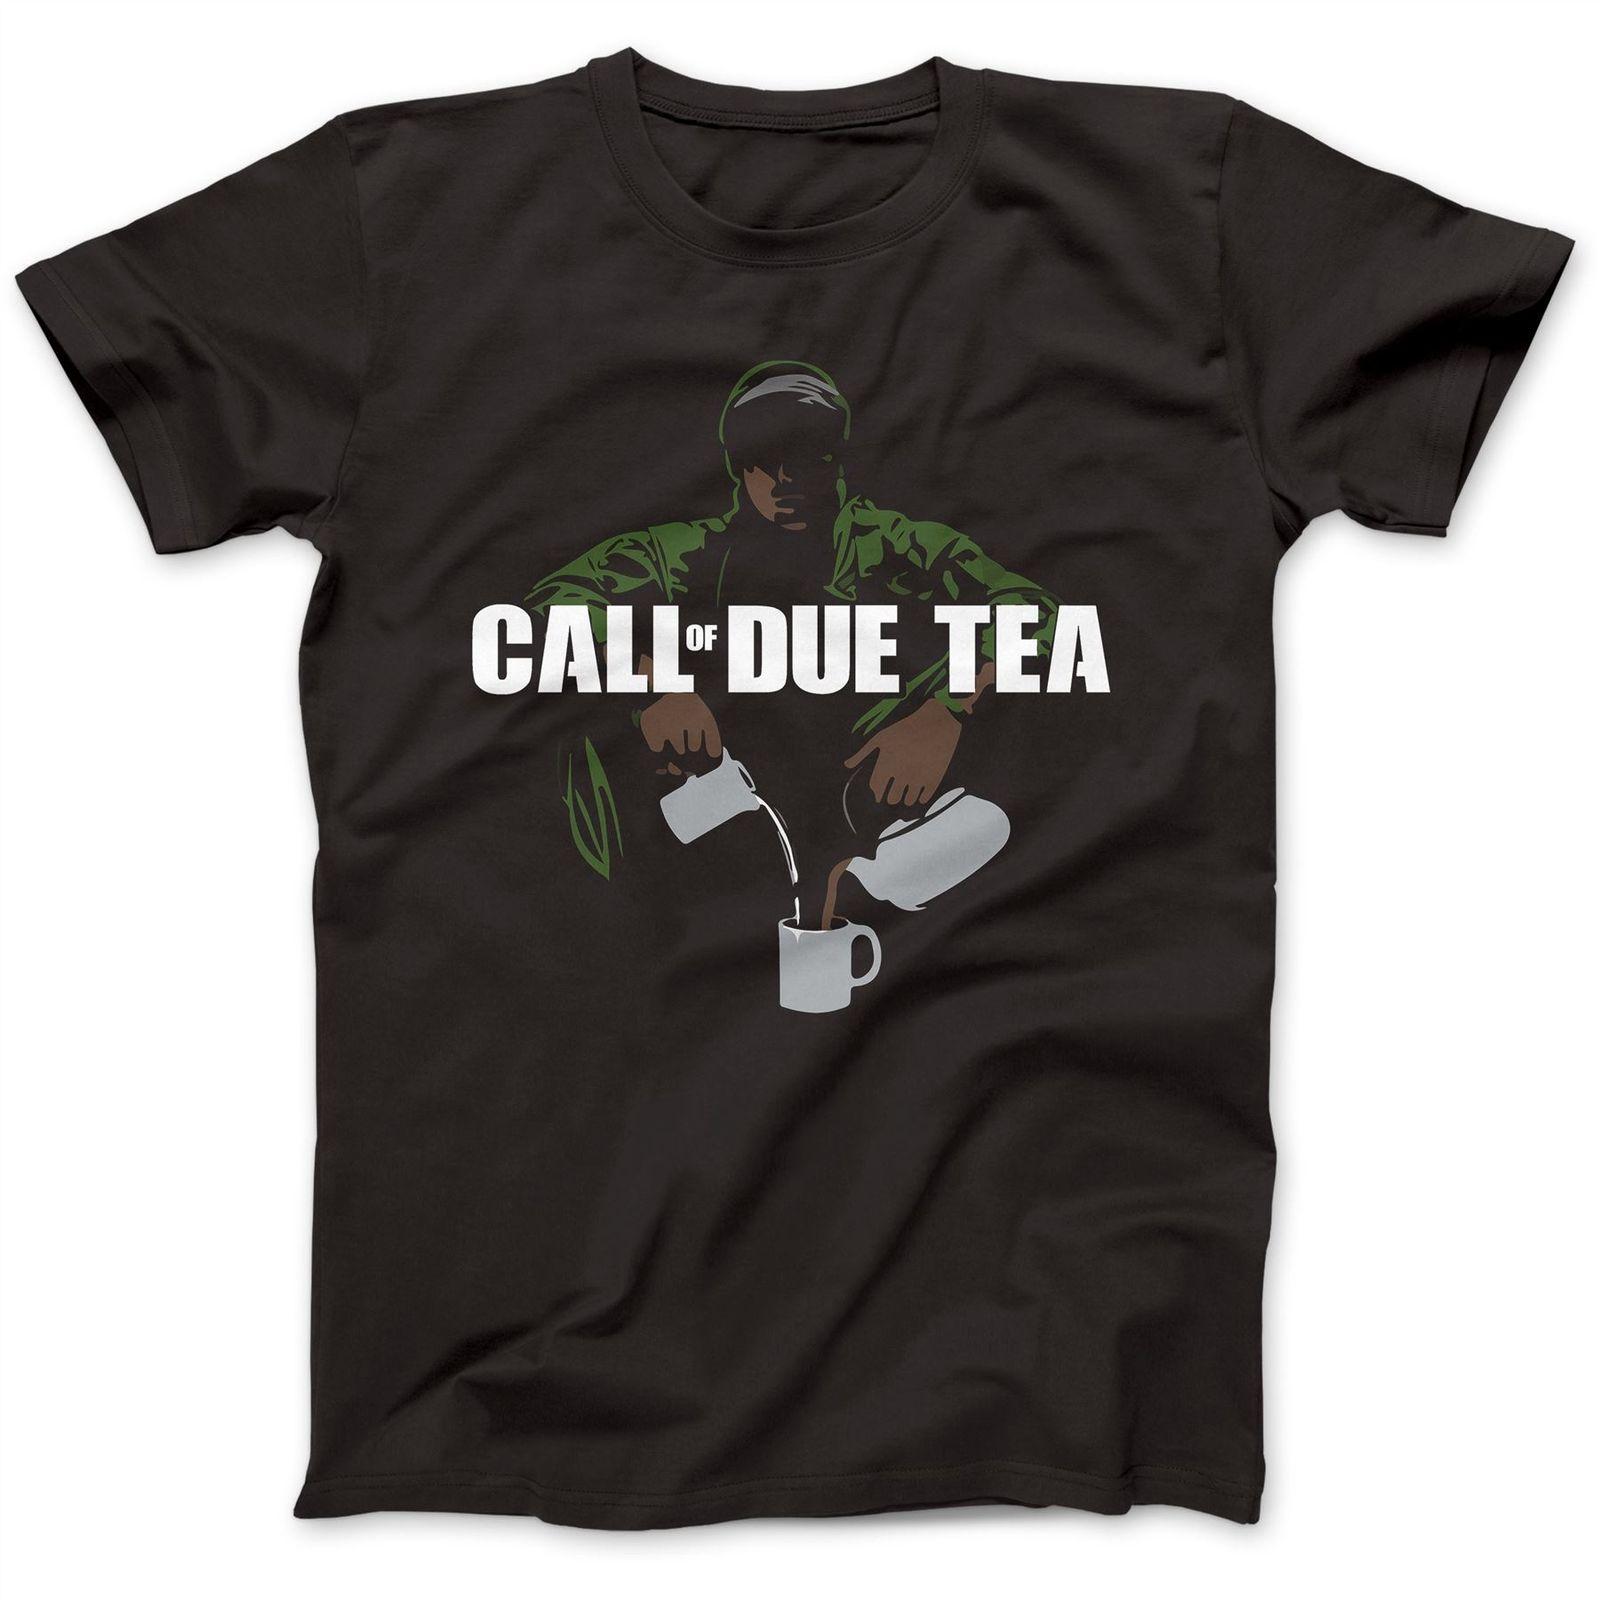 Call Of Due Tea Parody T-Shirt 100% Premium Cotton Advanced Warfare Duty